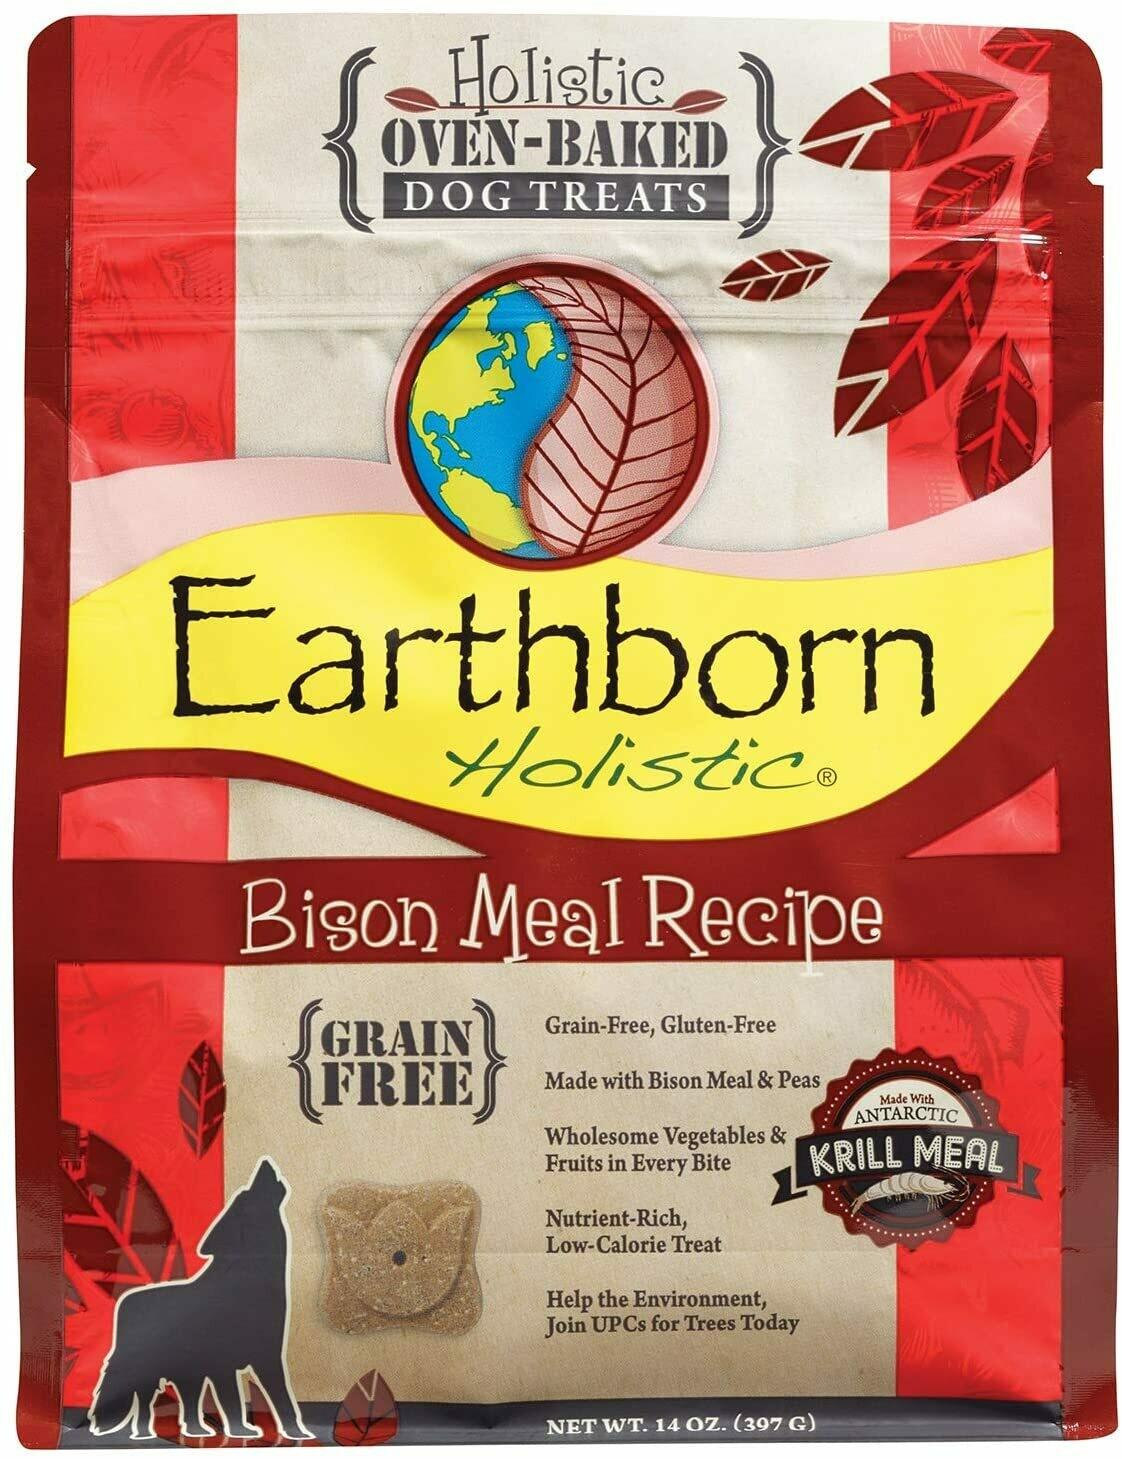 Earthborn Holistic Biscuit 14oz - Bison